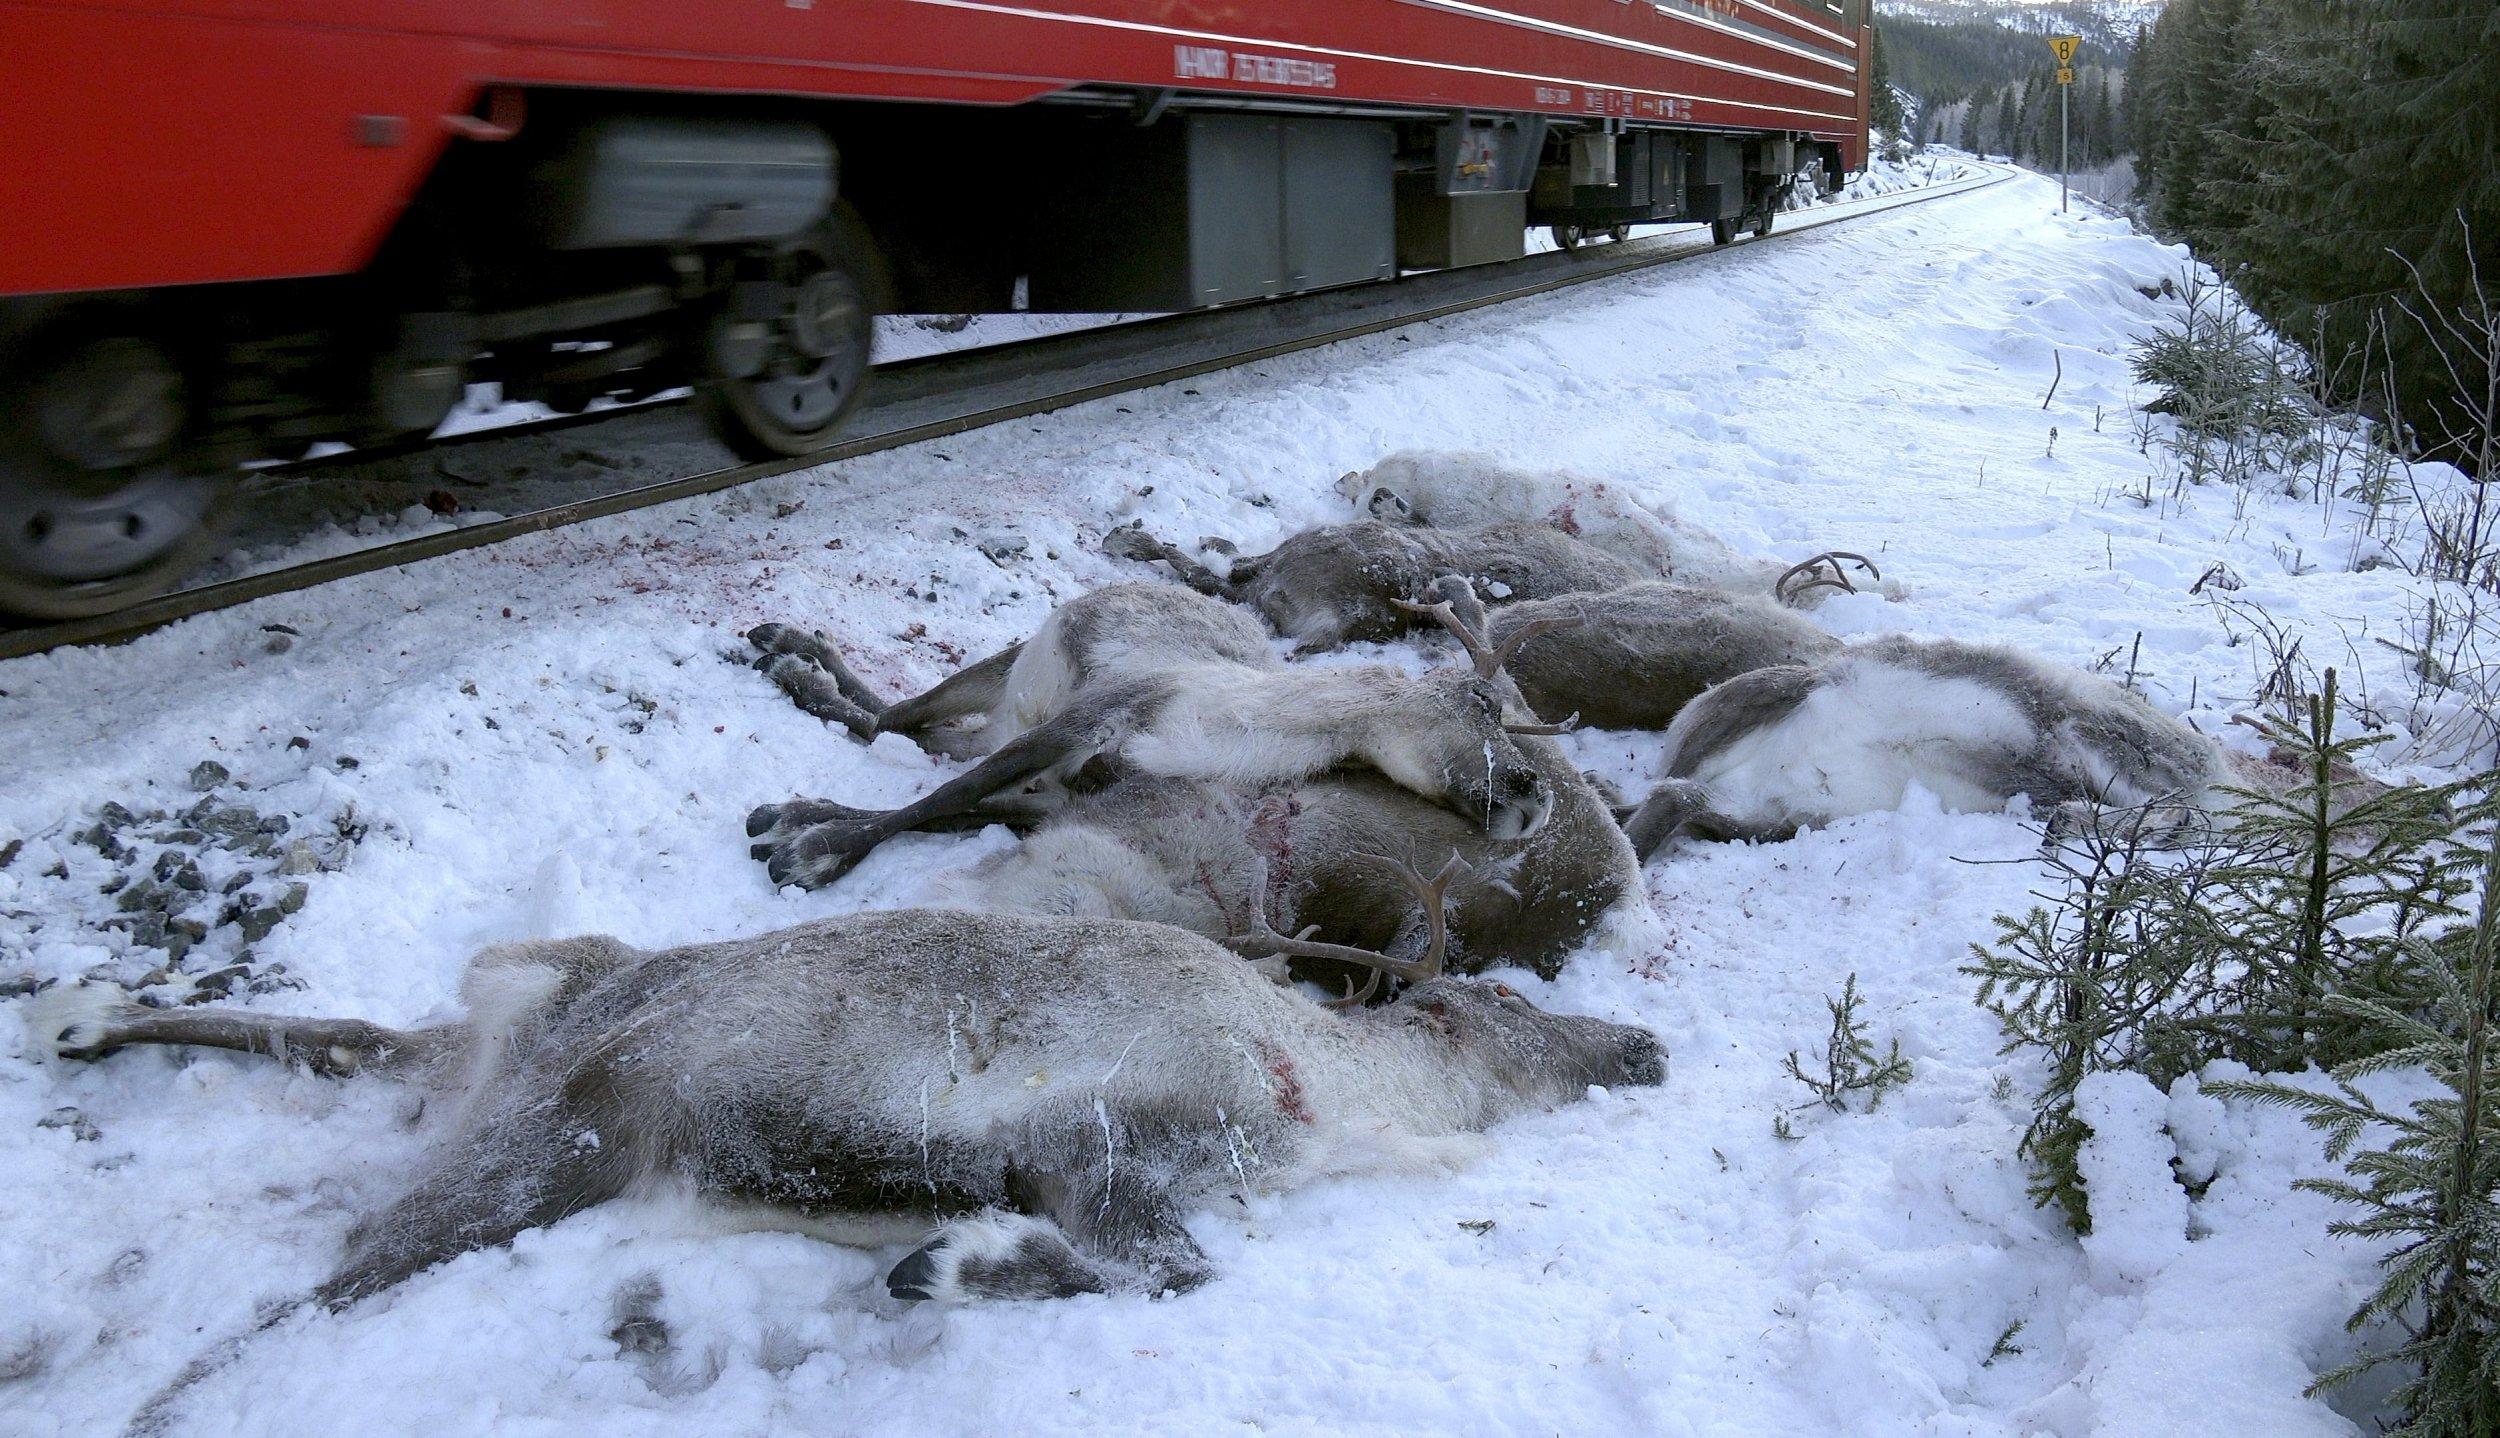 An unprecedented amount of reindeer have been killed this week